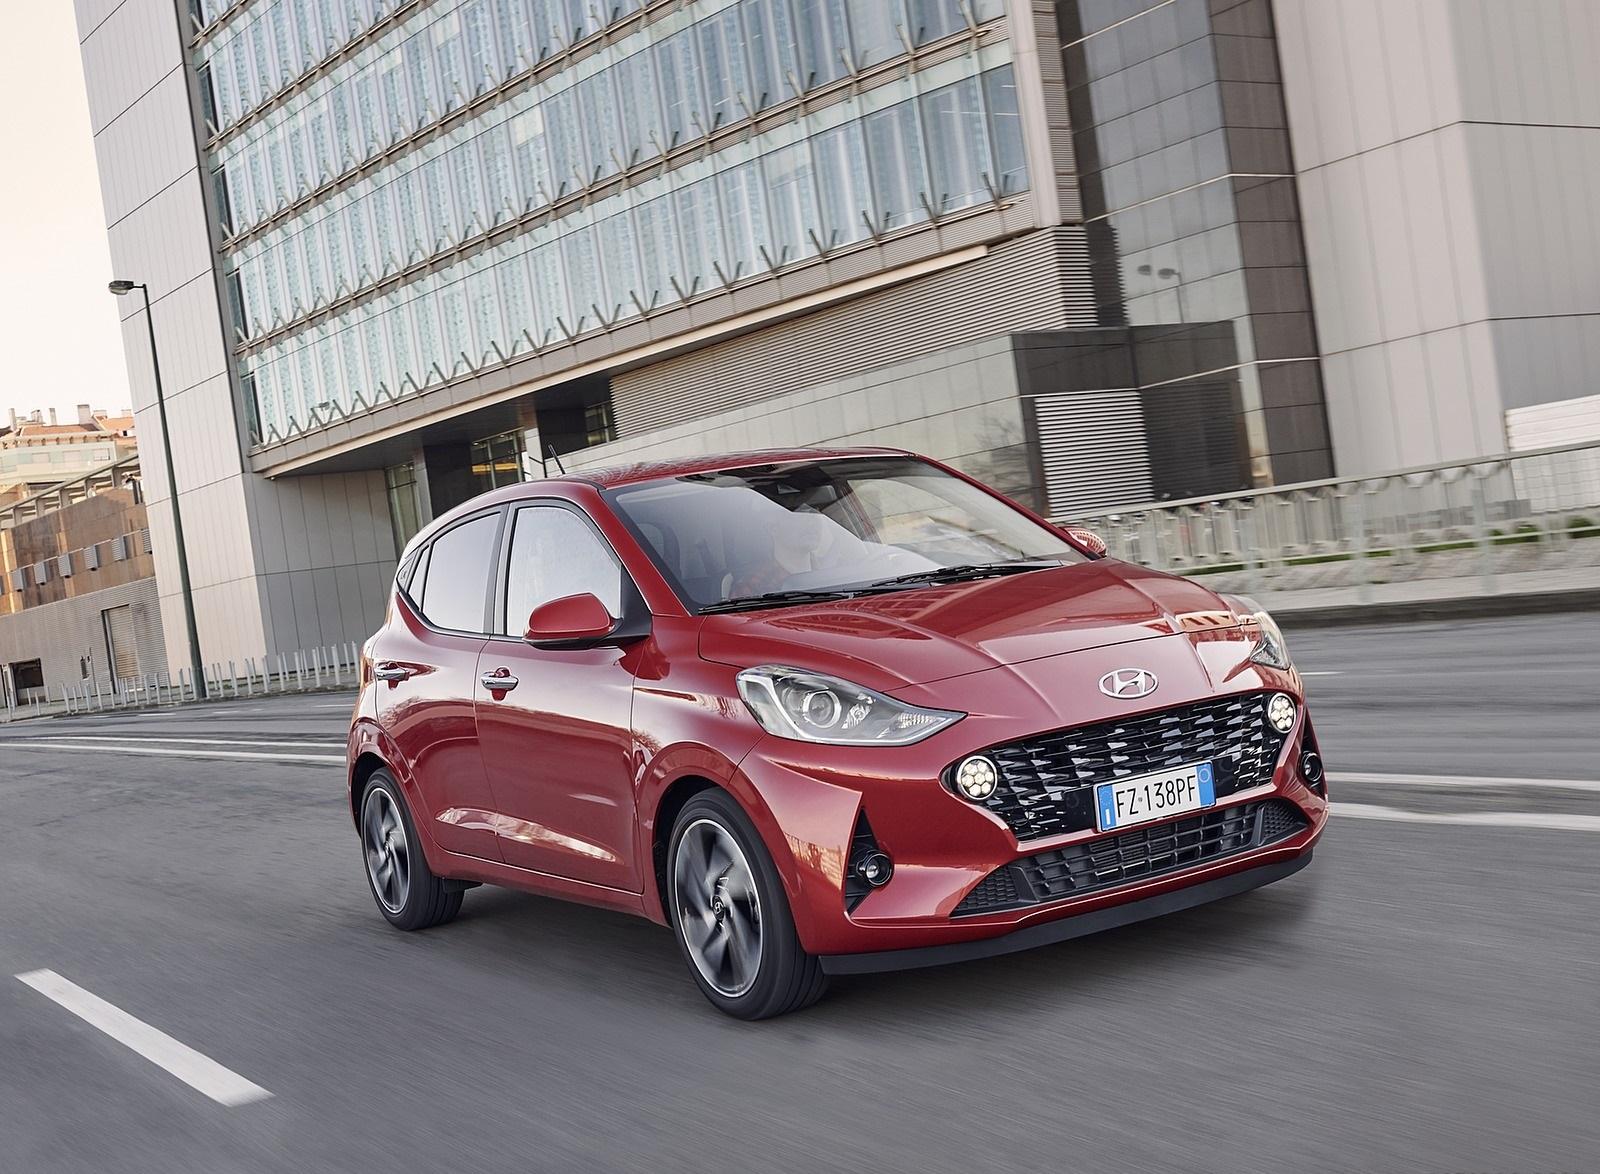 2020 Hyundai i10 Front Three-Quarter Wallpapers #16 of 80